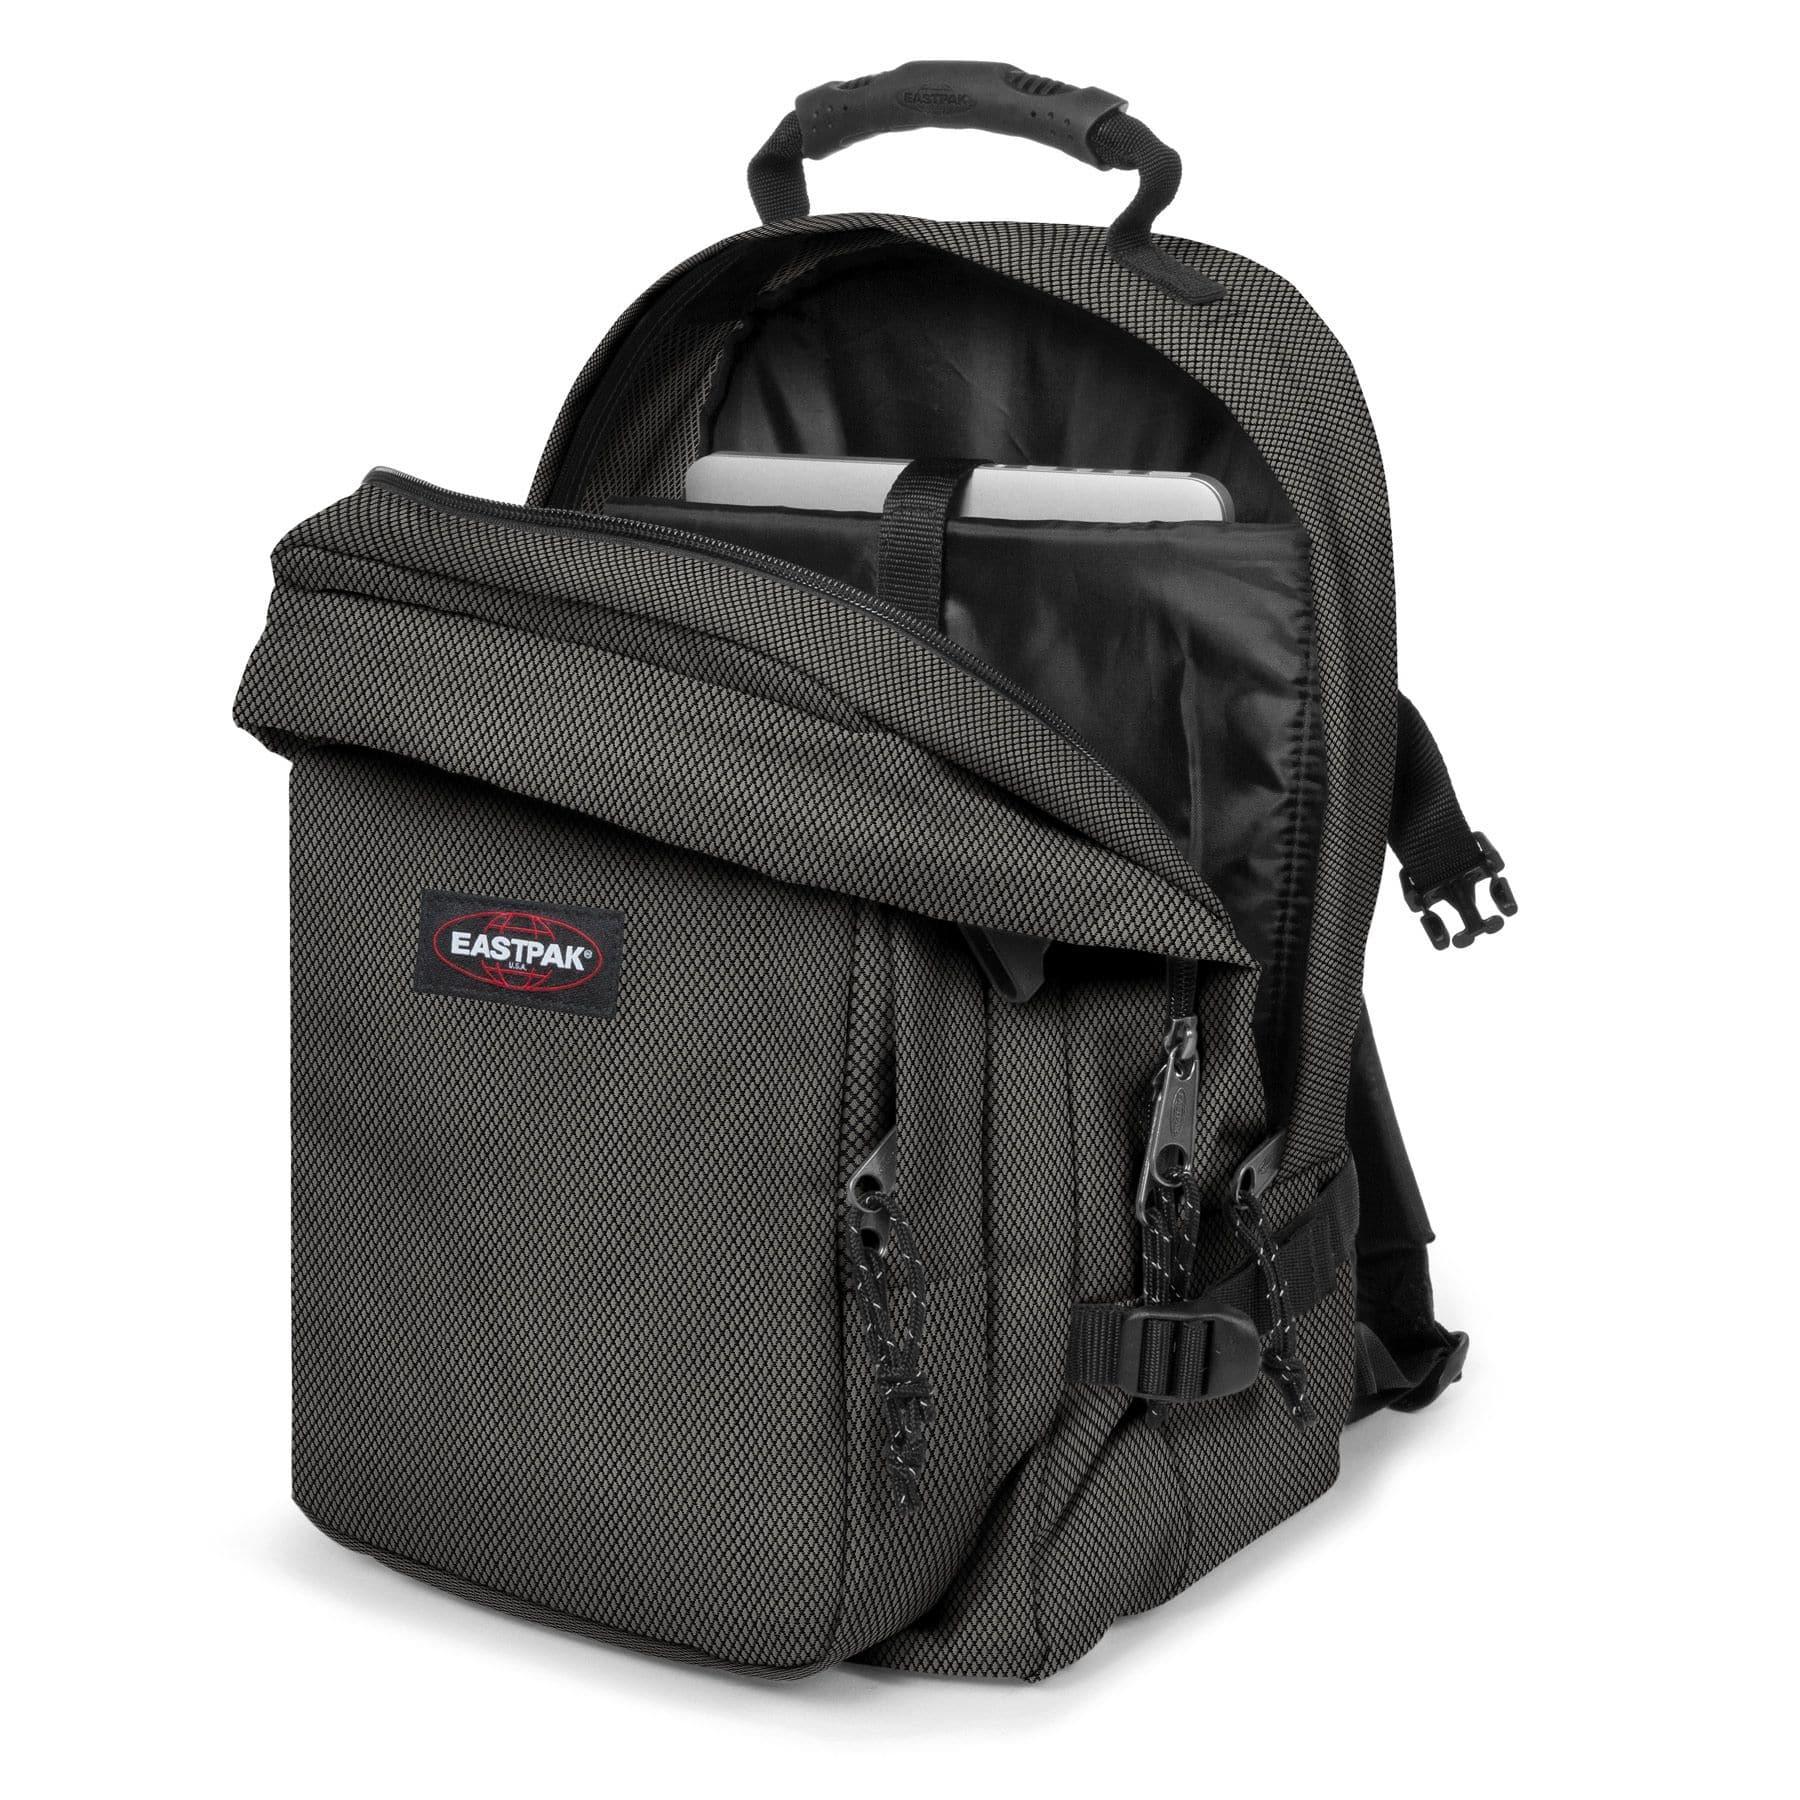 Eastpak Provider Meshknit Grey-185028